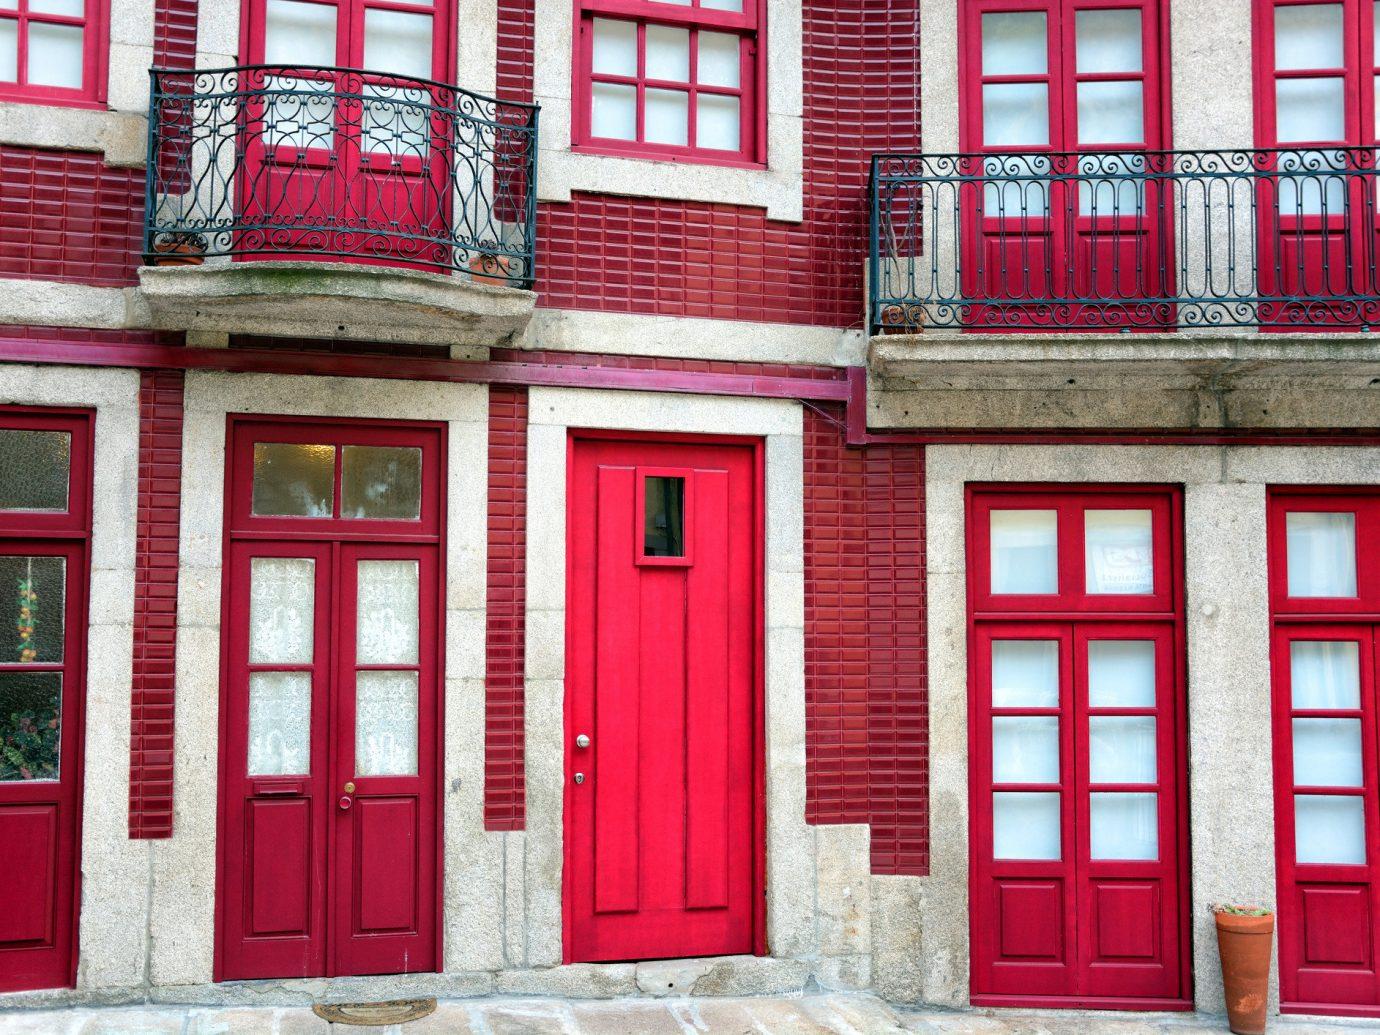 Offbeat Trip Ideas building outdoor red color house Architecture facade window door interior design window covering